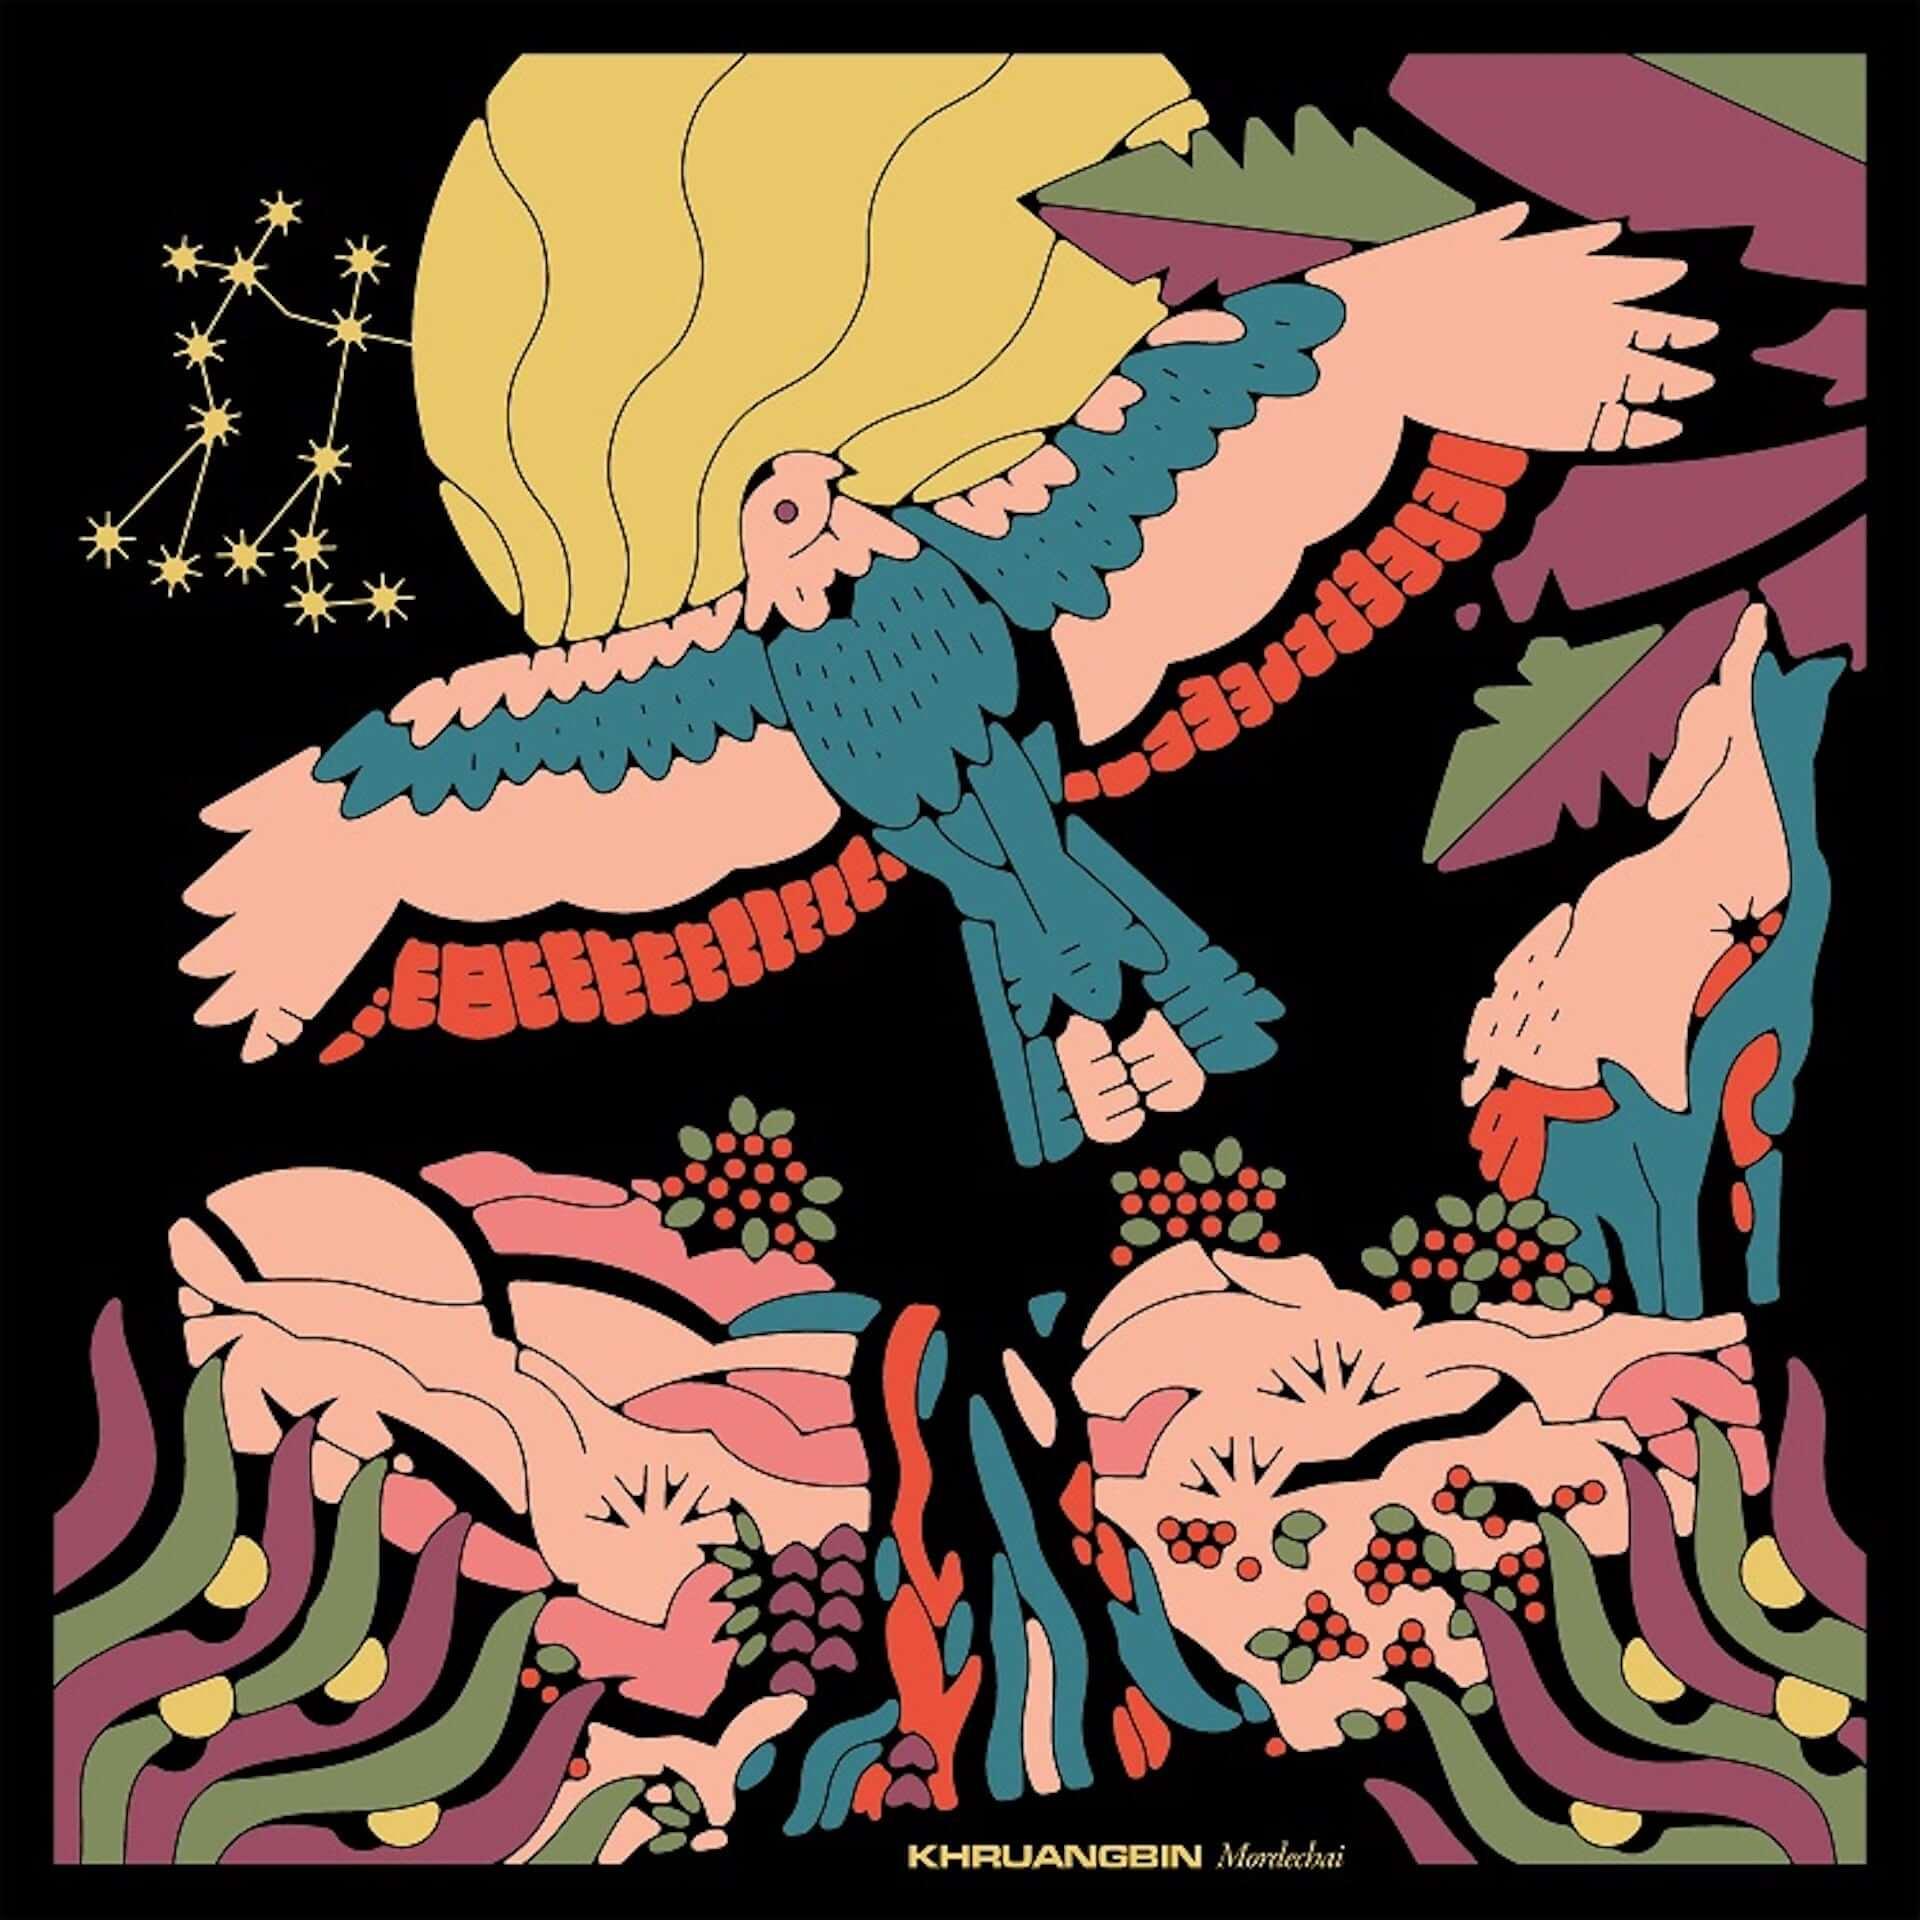 Khruangbinのニューアルバム『MORDECHAI』リリース記念フェアが代官山蔦屋書店にて開催!MVに登場する巨大ぬぐるみ展示も ac200629_khruangbin_tsutaya_02-1920x1920